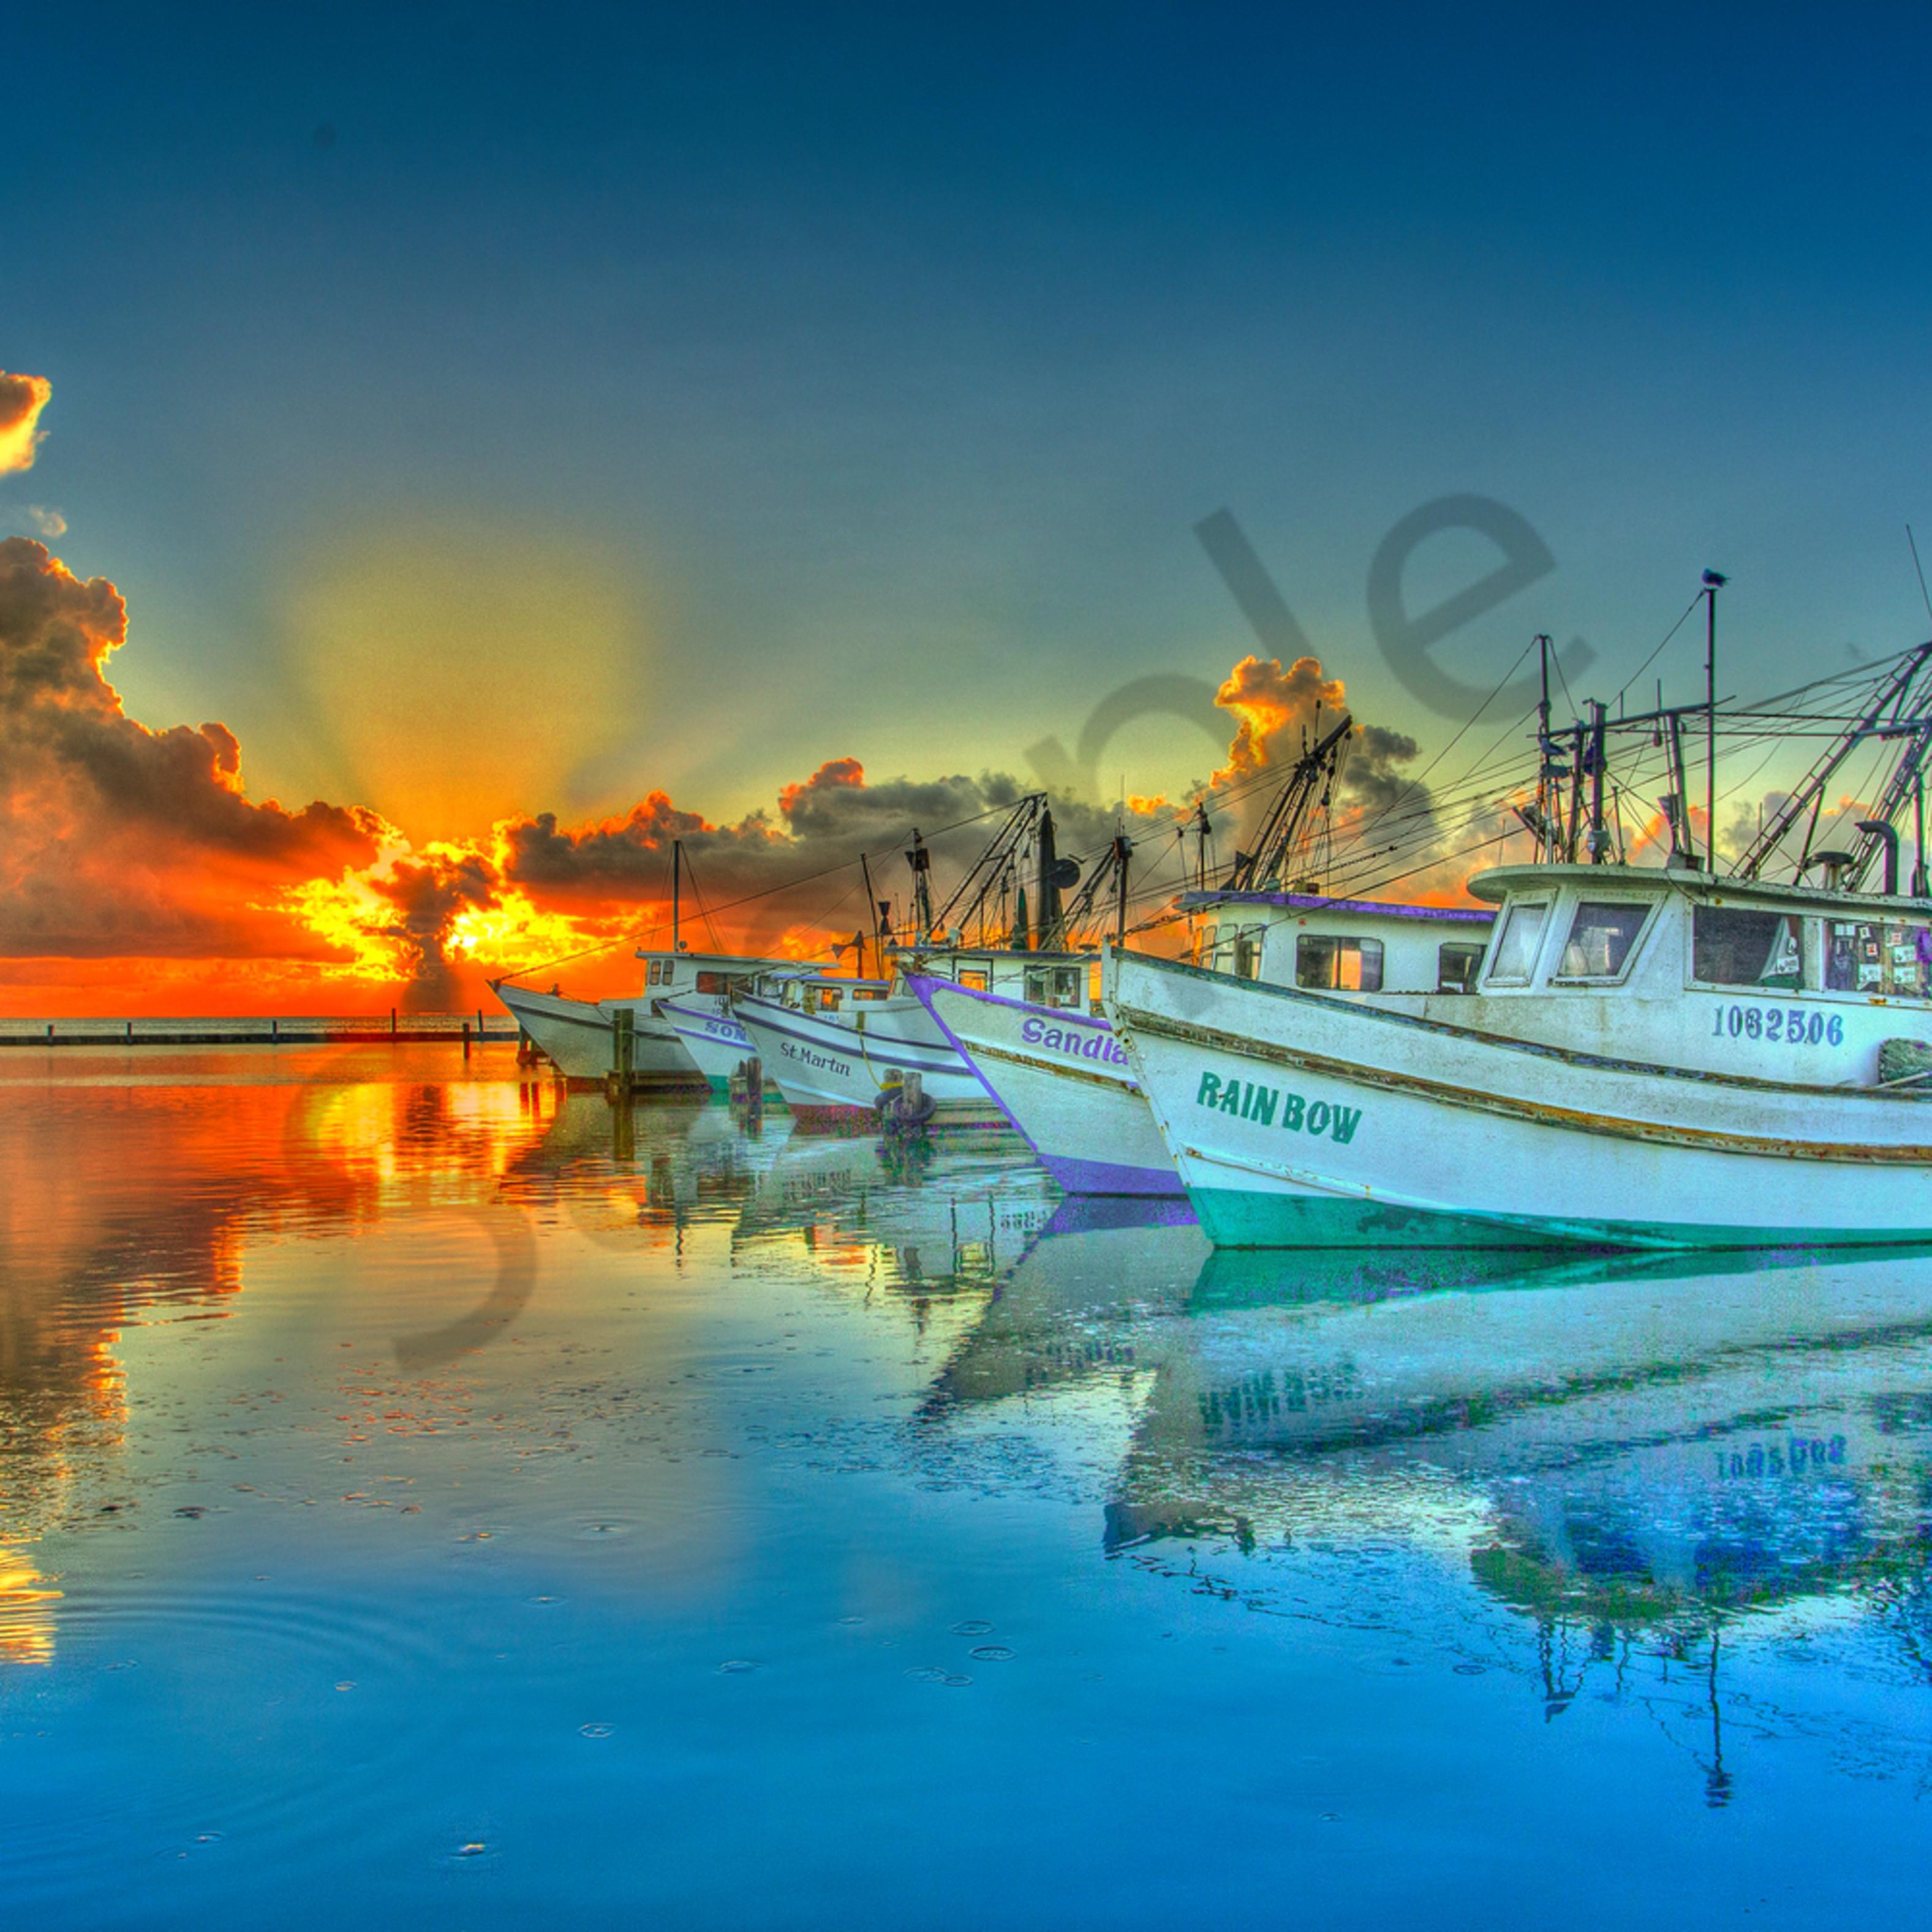 Fulton harbor fireworks zityxi